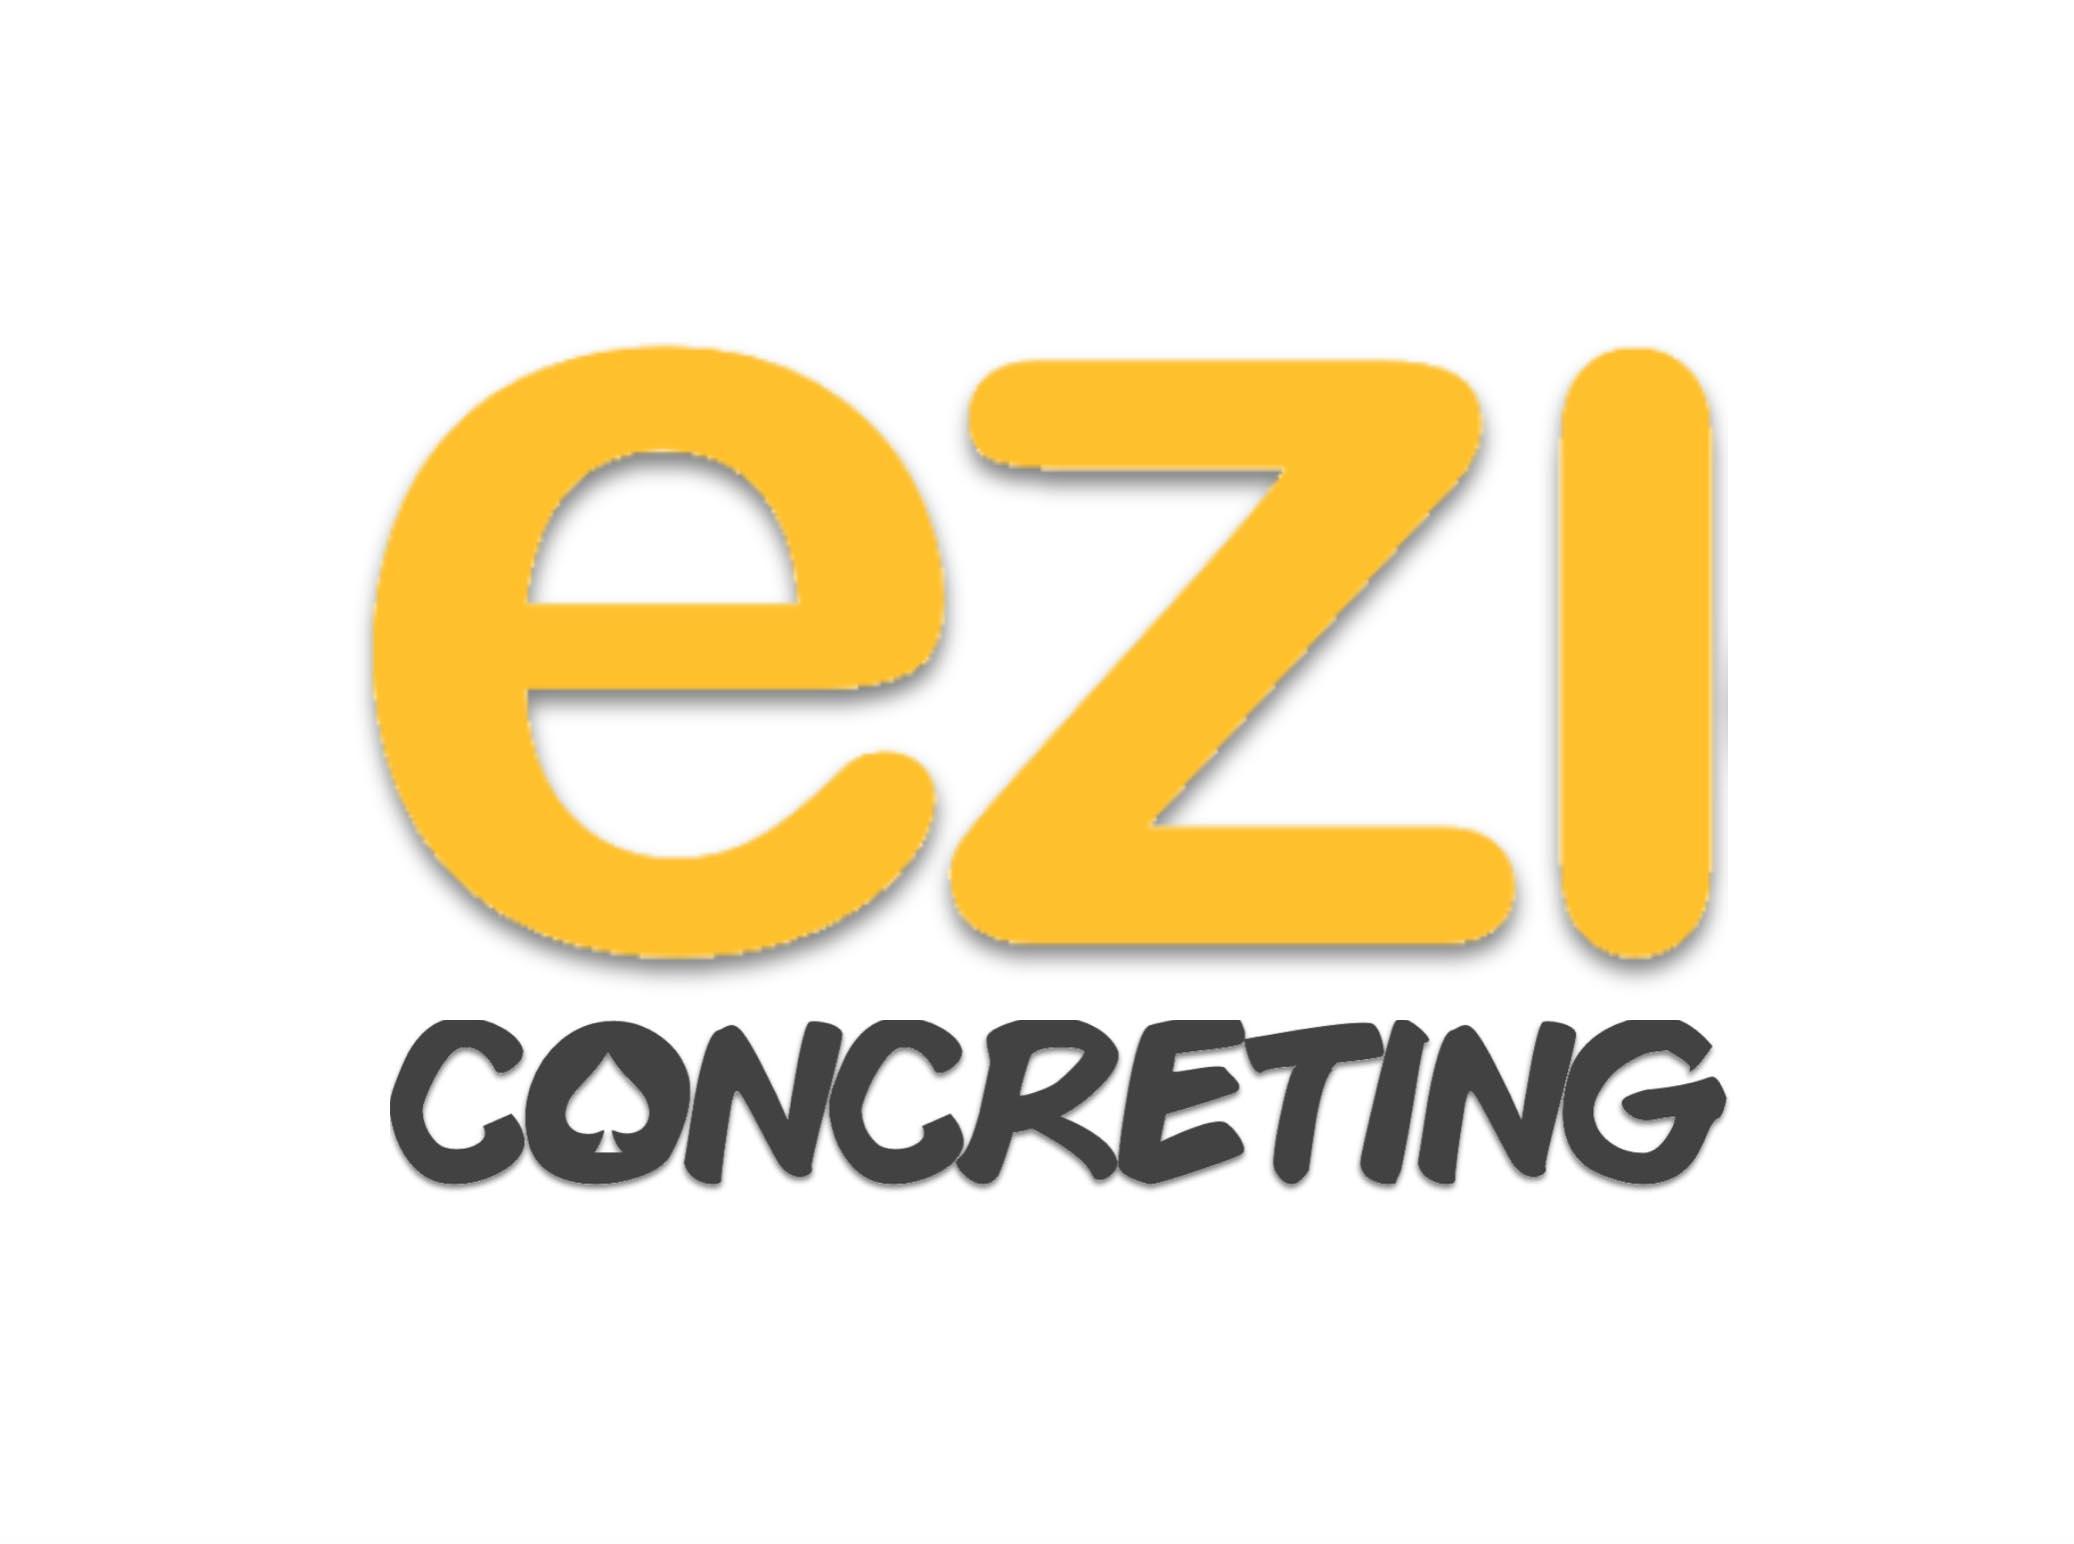 Ezi Concreting